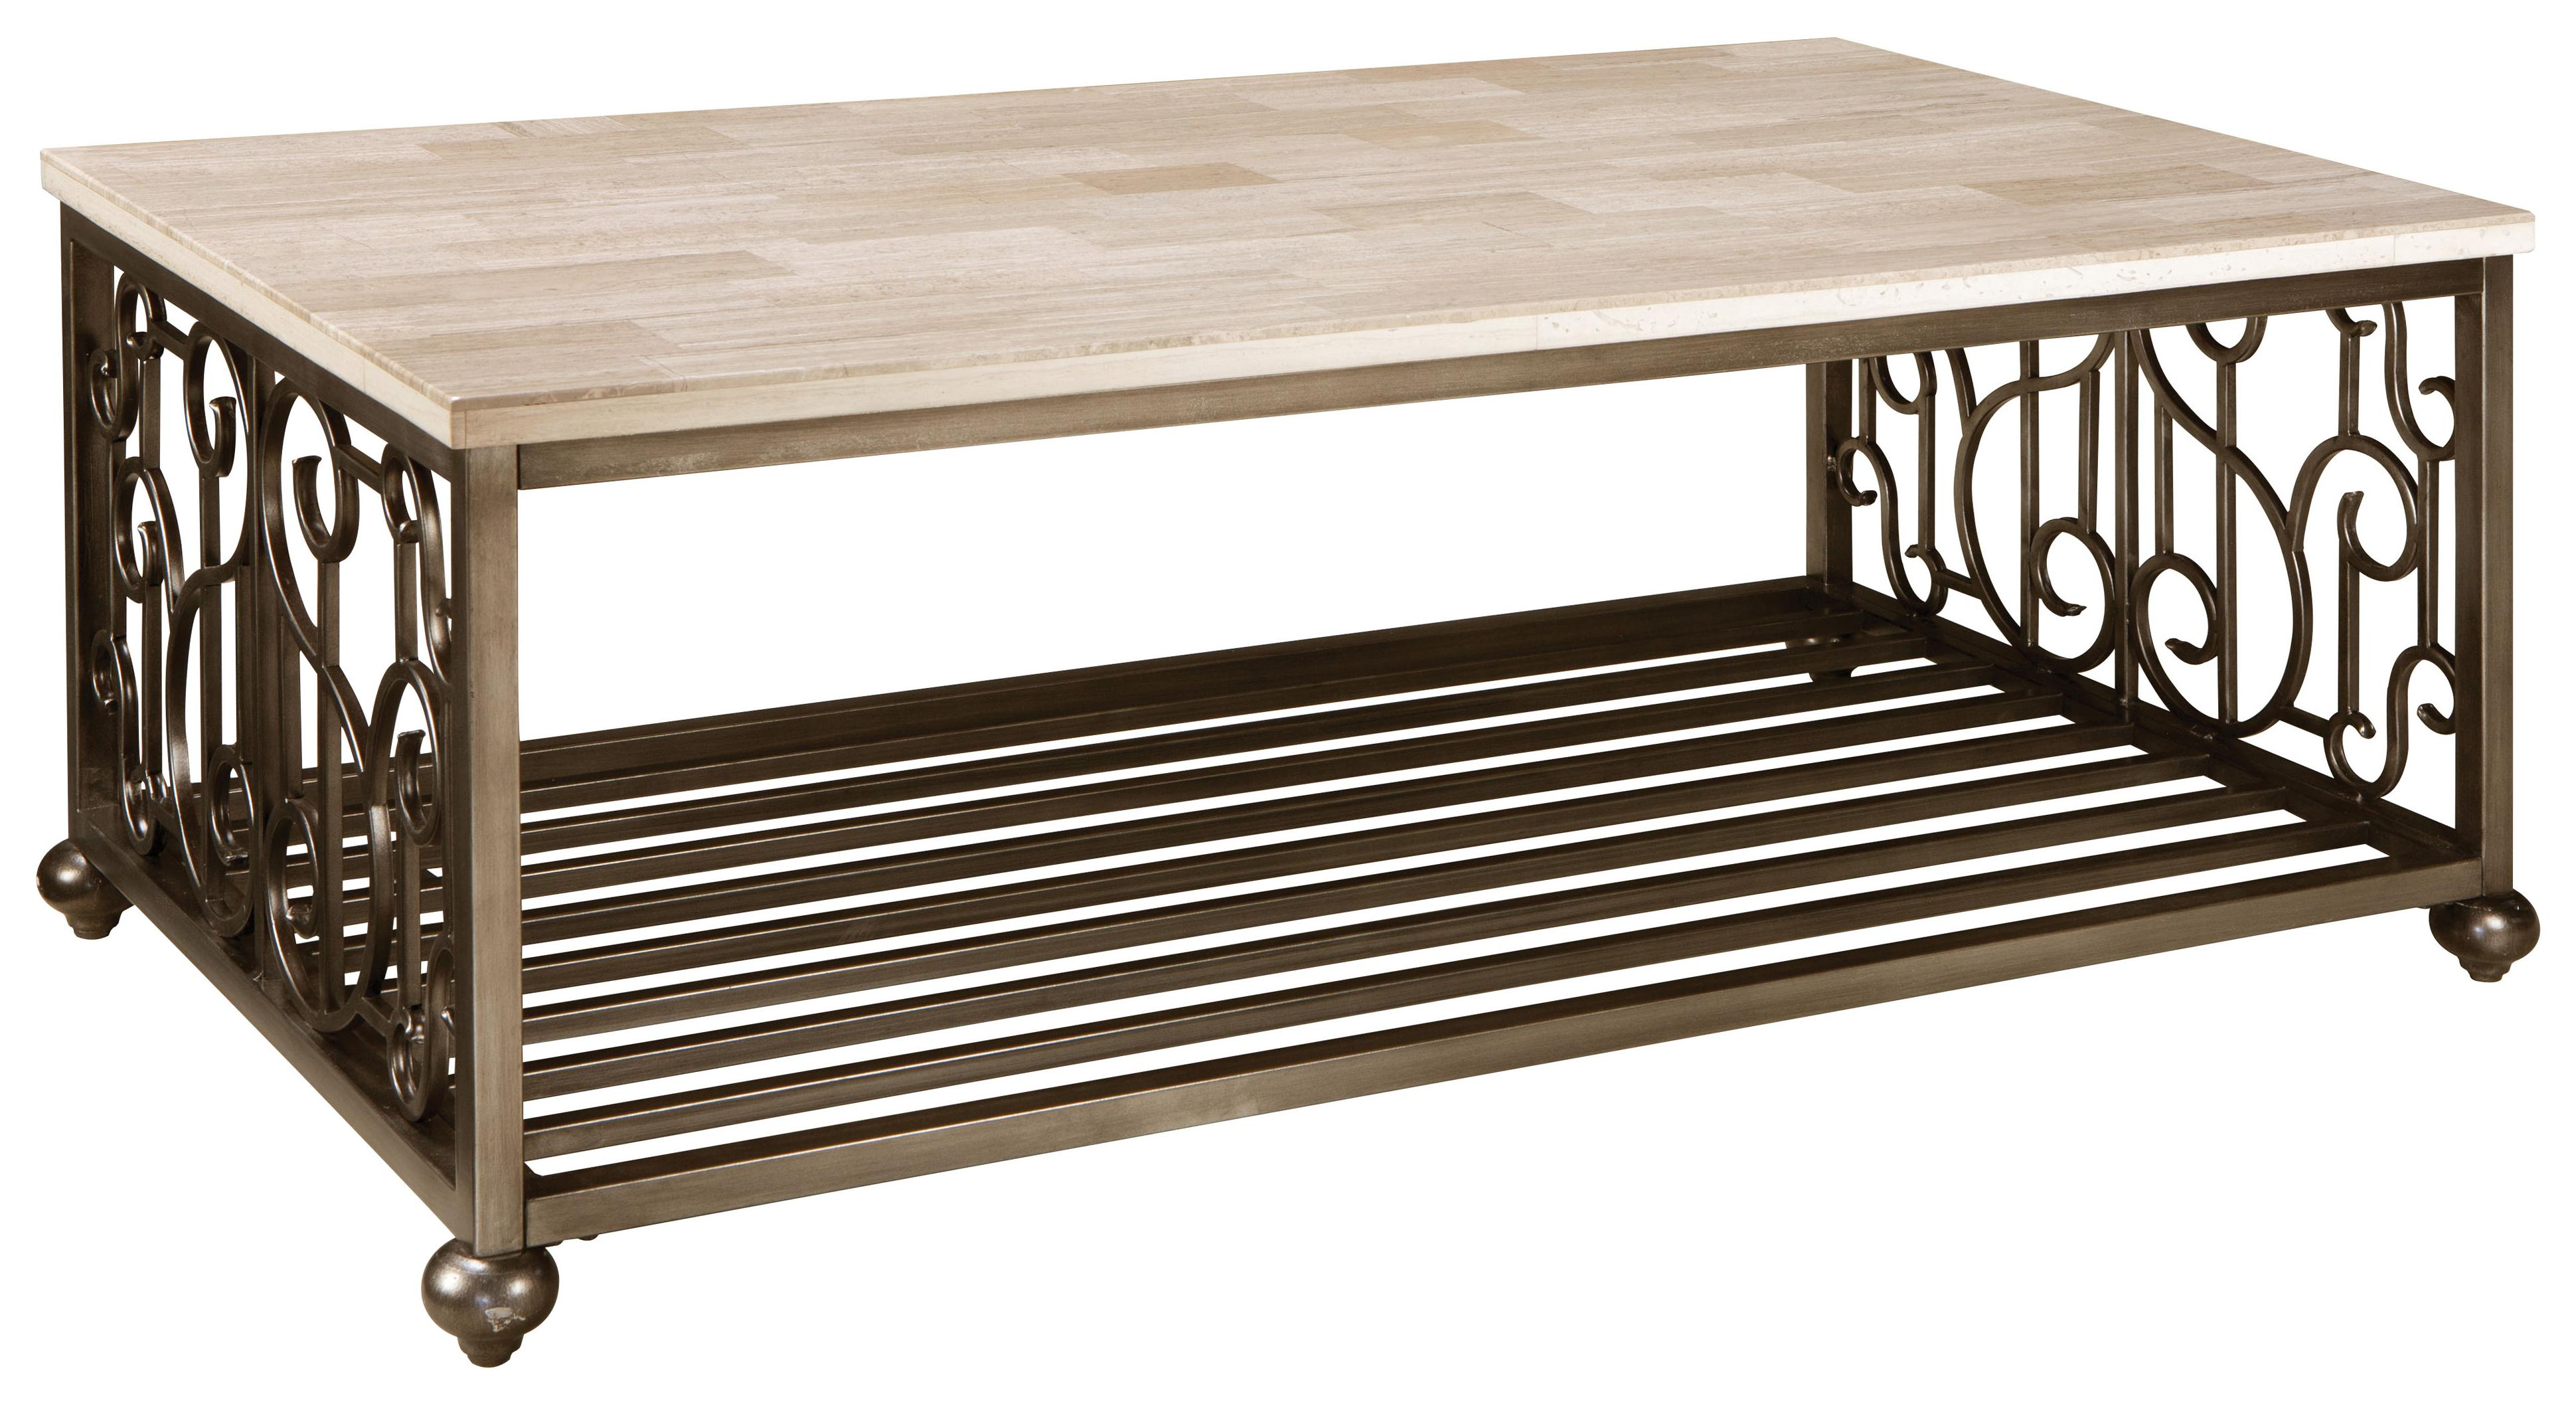 Standard Furniture Toscana  Rectangular Cocktail Table - Item Number: 27411